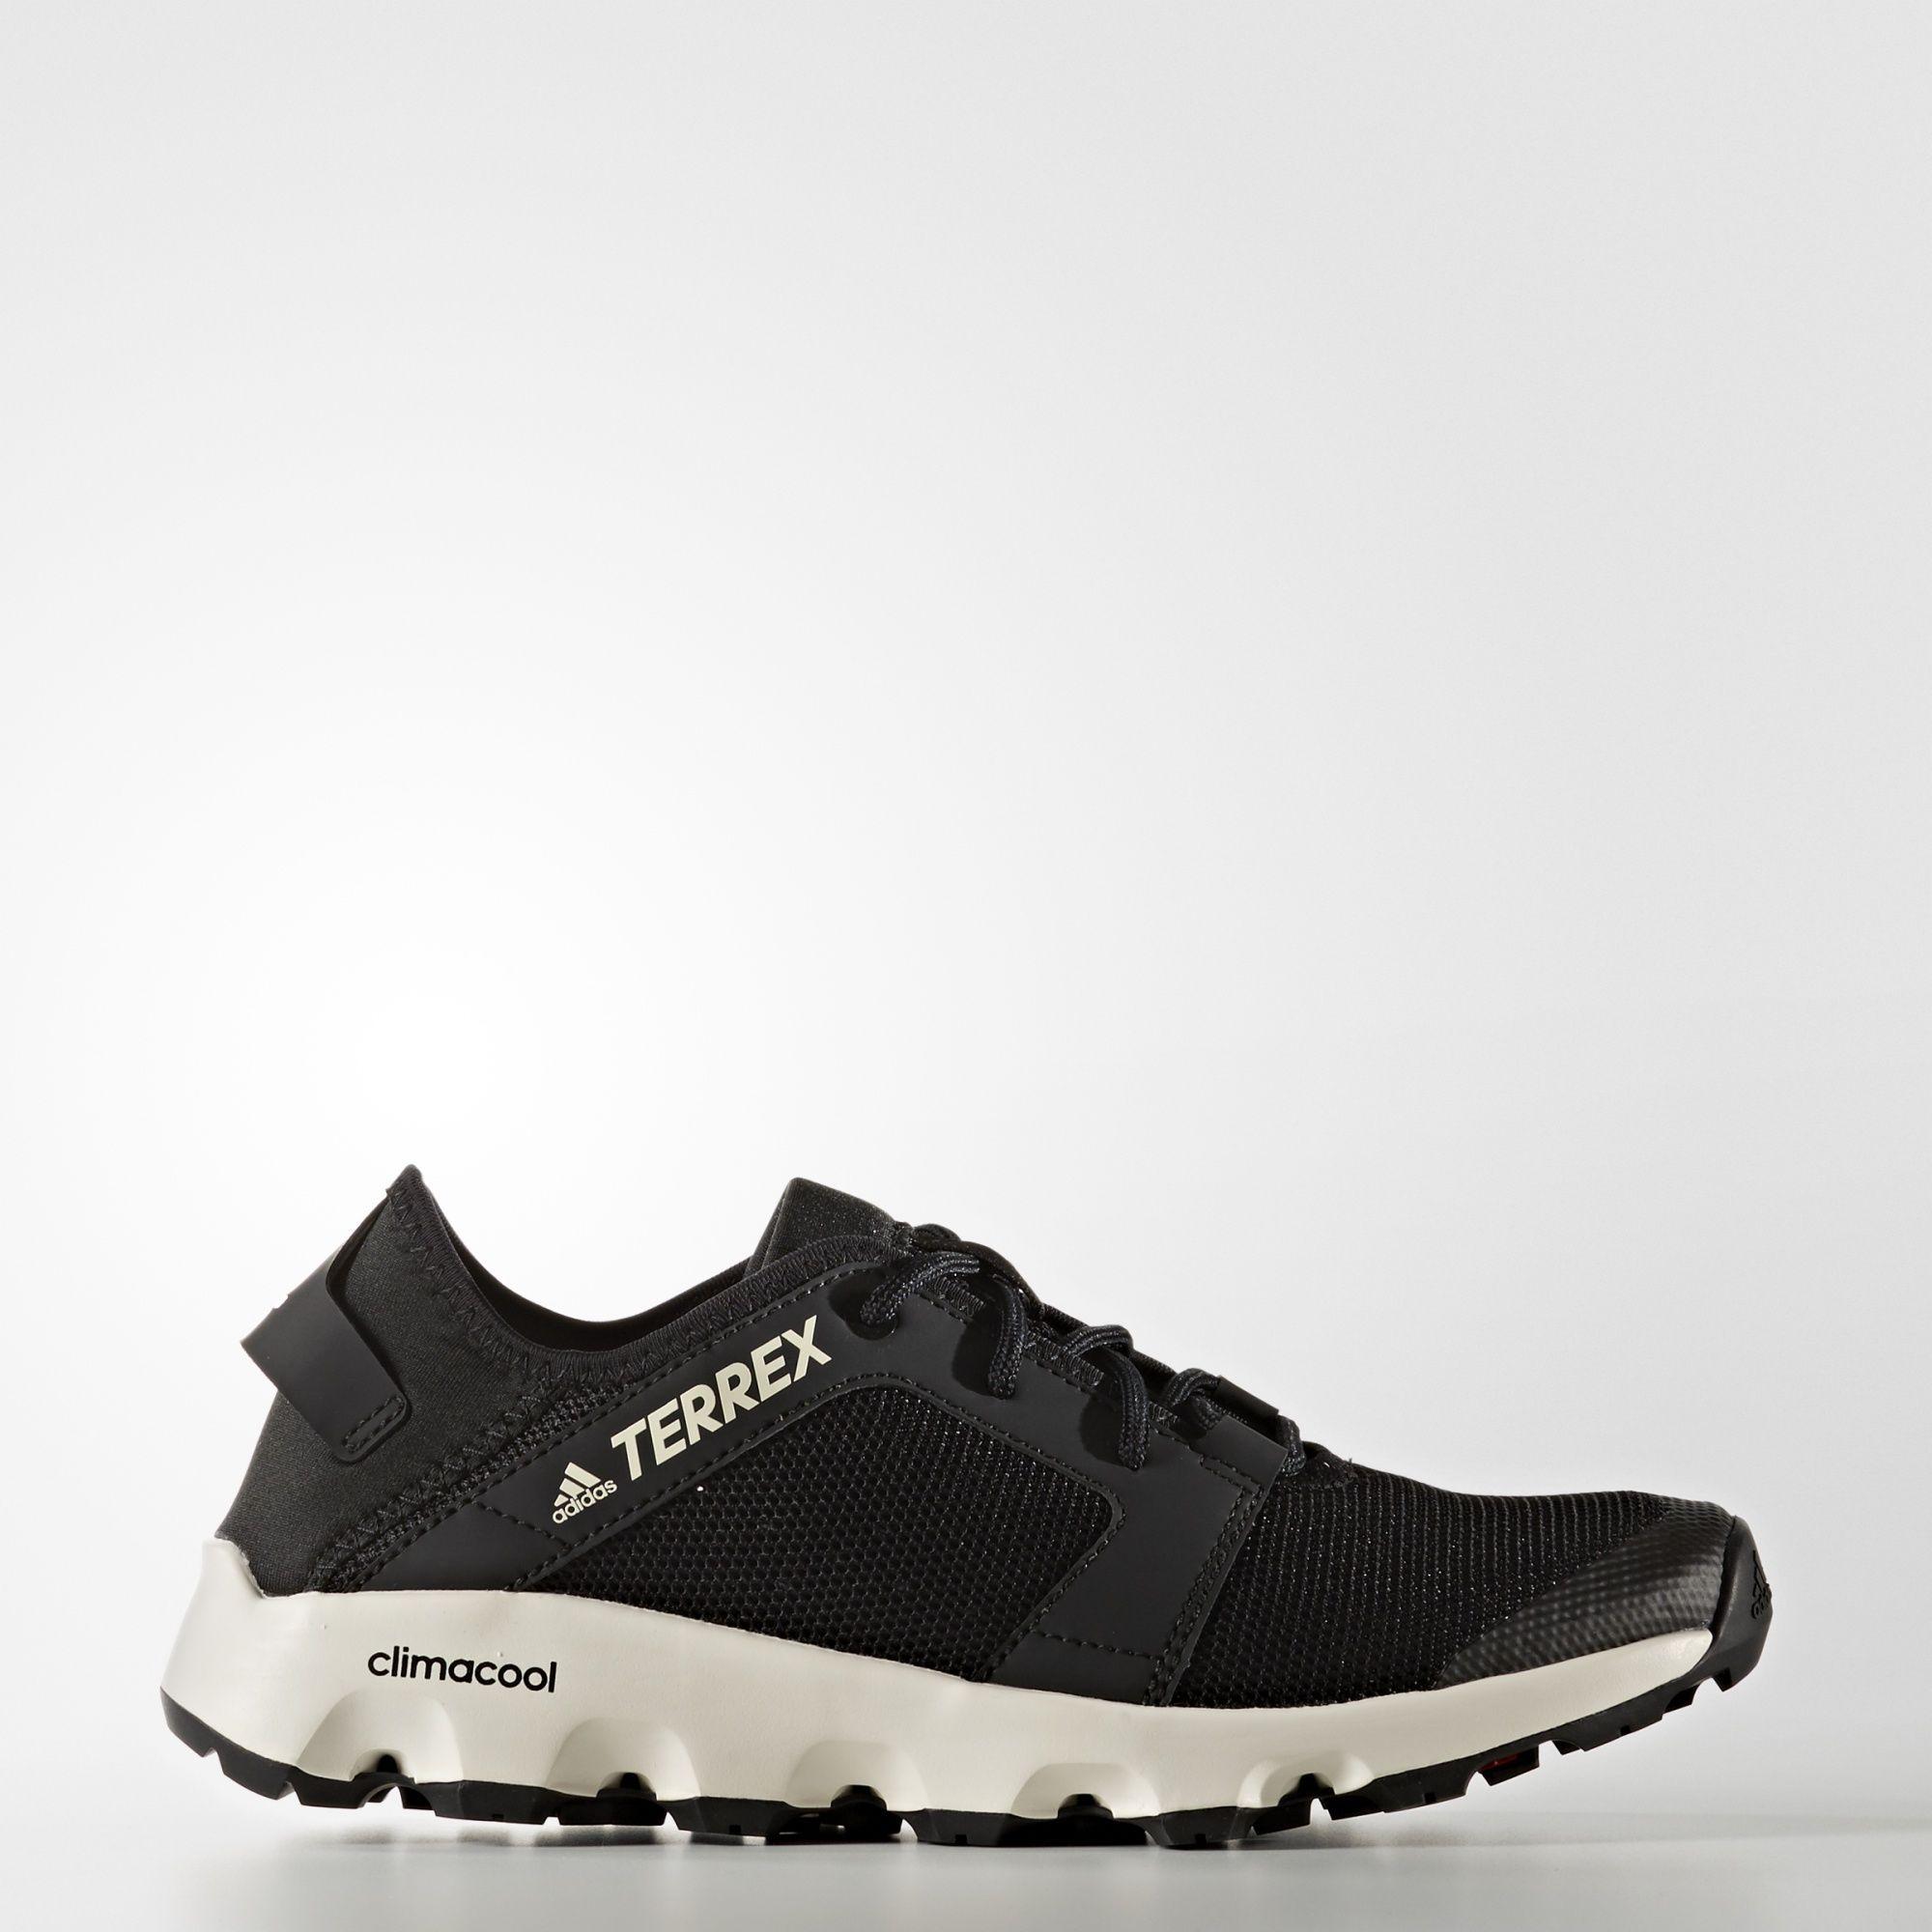 8e1685cf92b294 adidas - TERREX Climacool Voyager Sleek Shoes